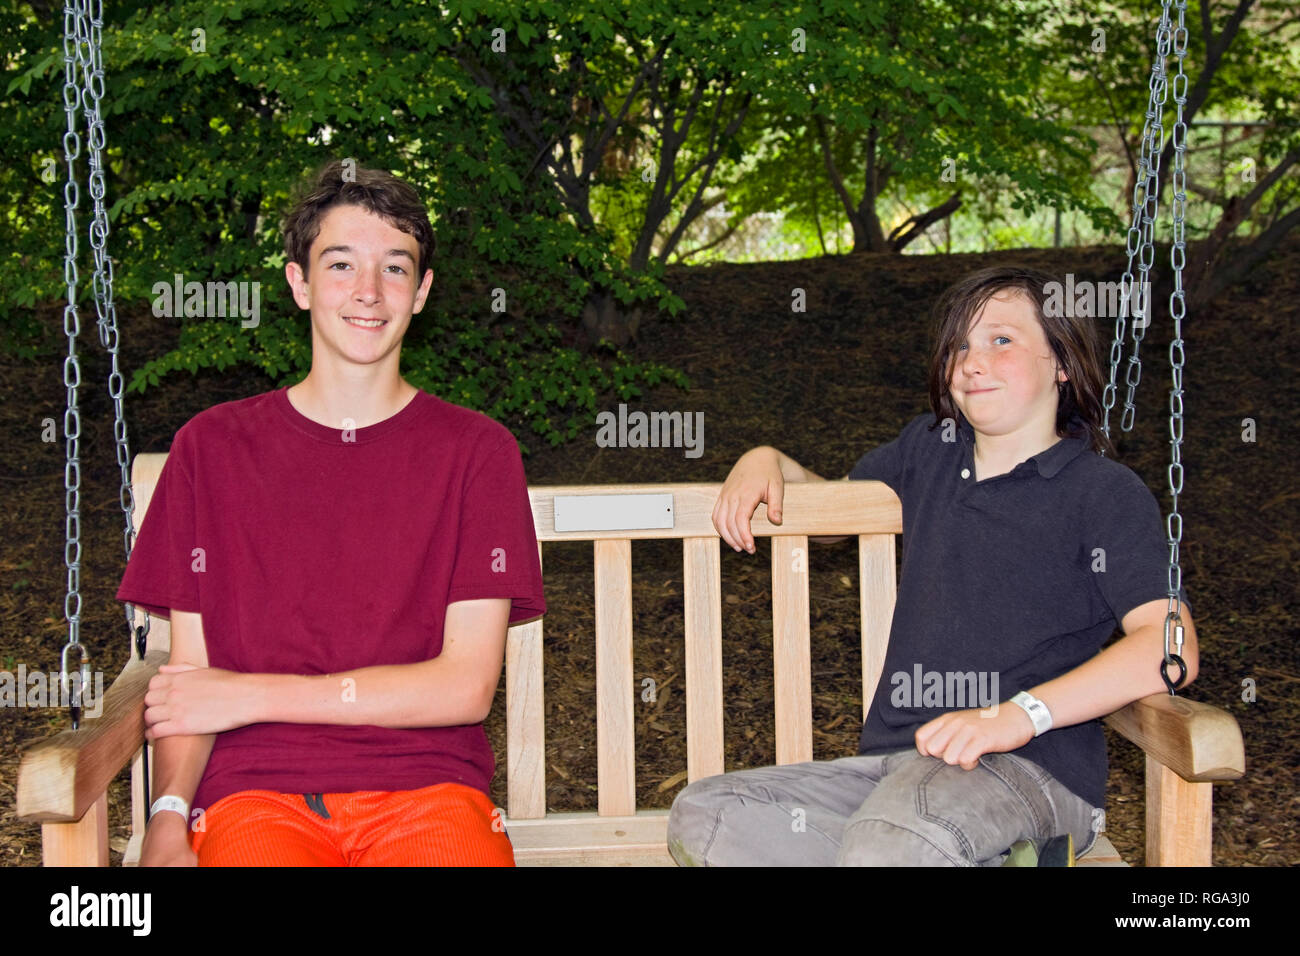 2 boys; wood swing; friends; woods; smiling; happy; teen; pre-teen; horizontal; MR - Stock Image